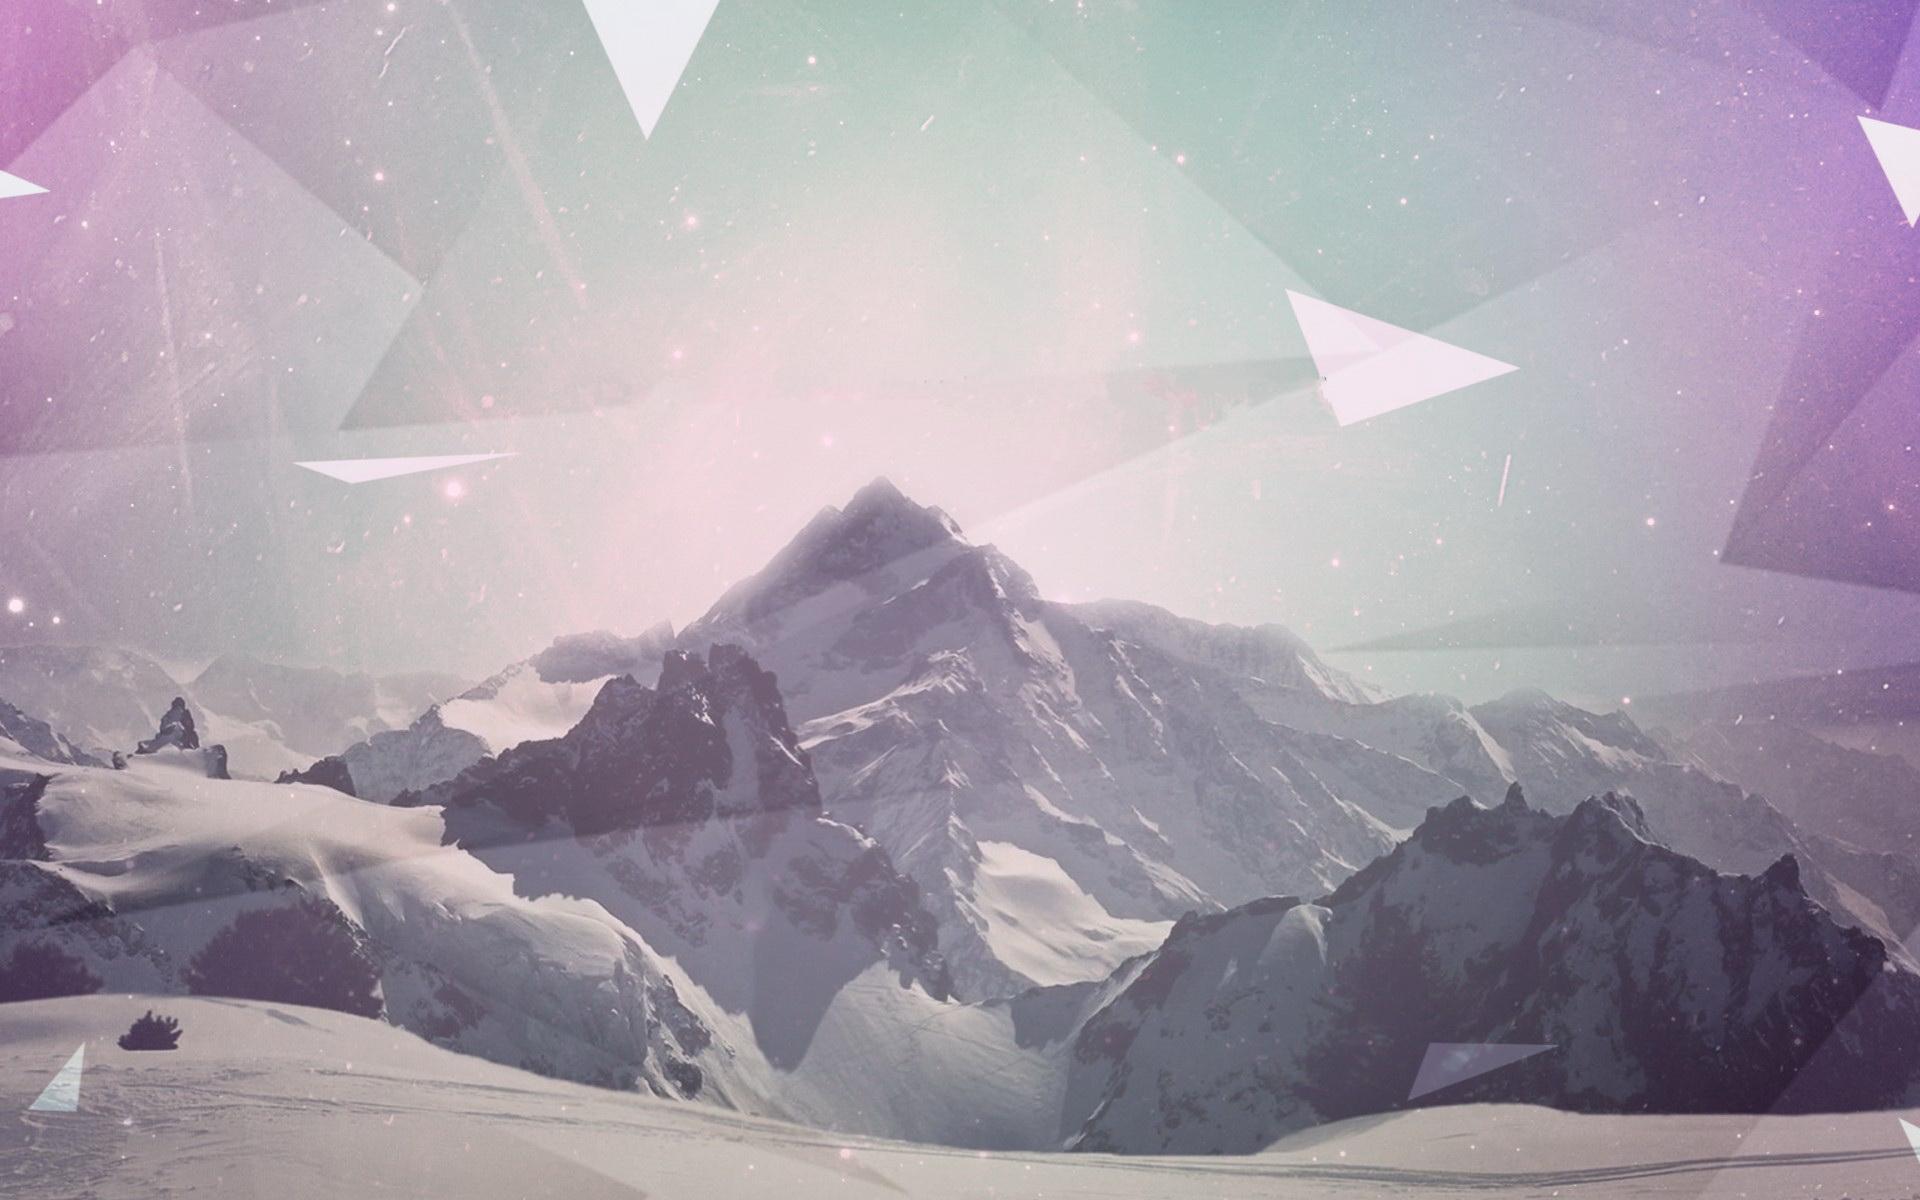 Mountain Hd Wallpaper Background Image 1920x1200 Id 595938